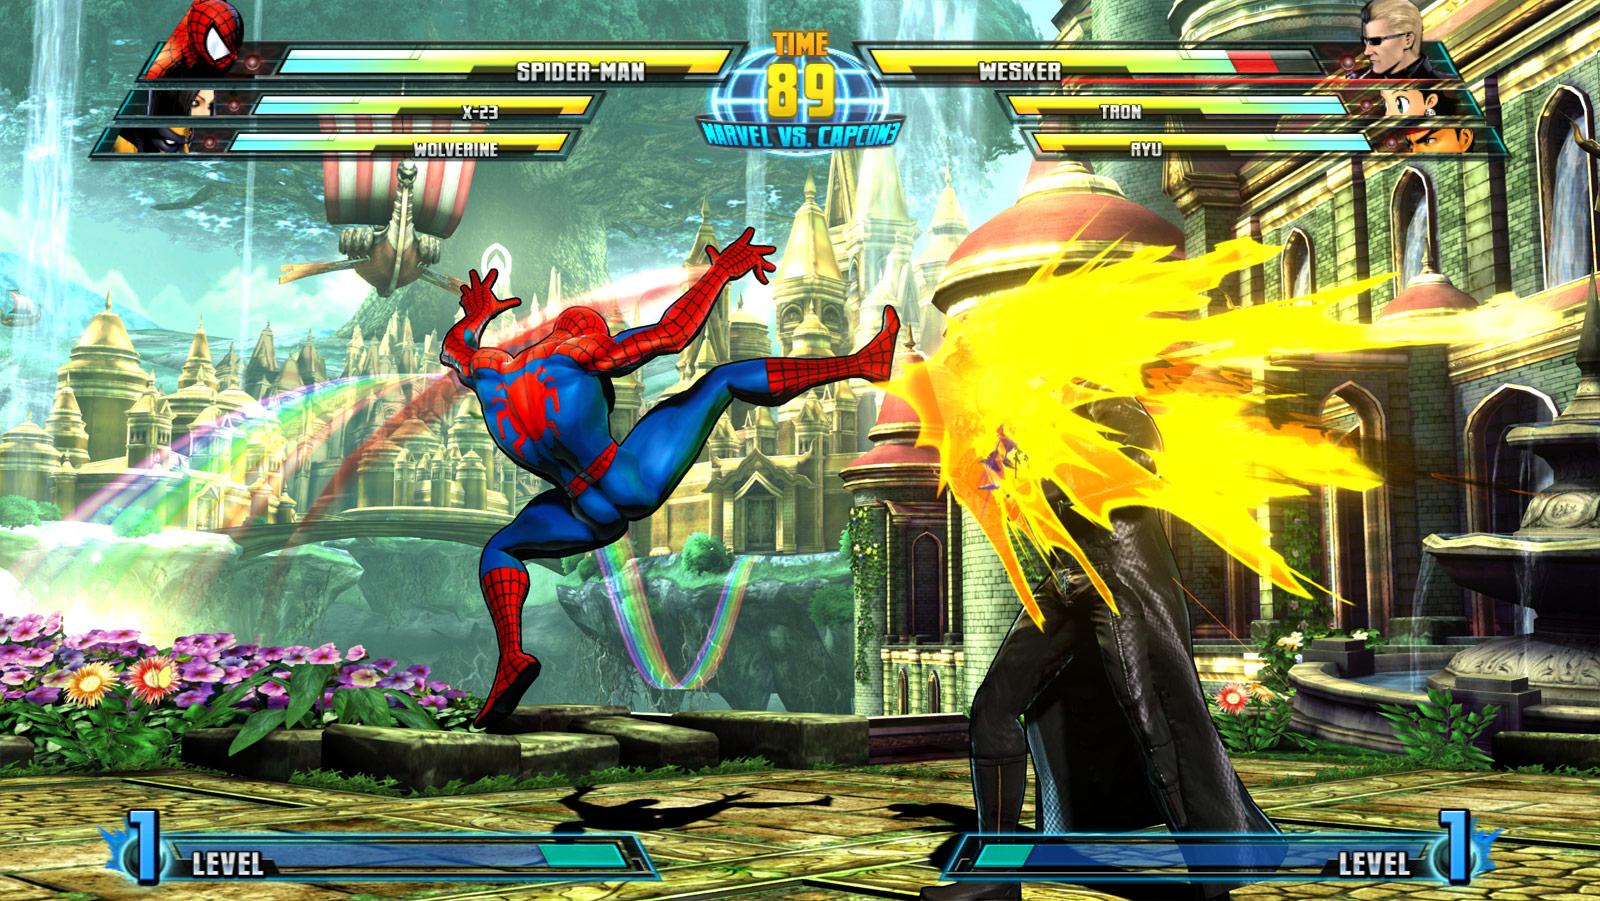 Marvel vs. Capcom 3 screen shot Sept. 21 image #3